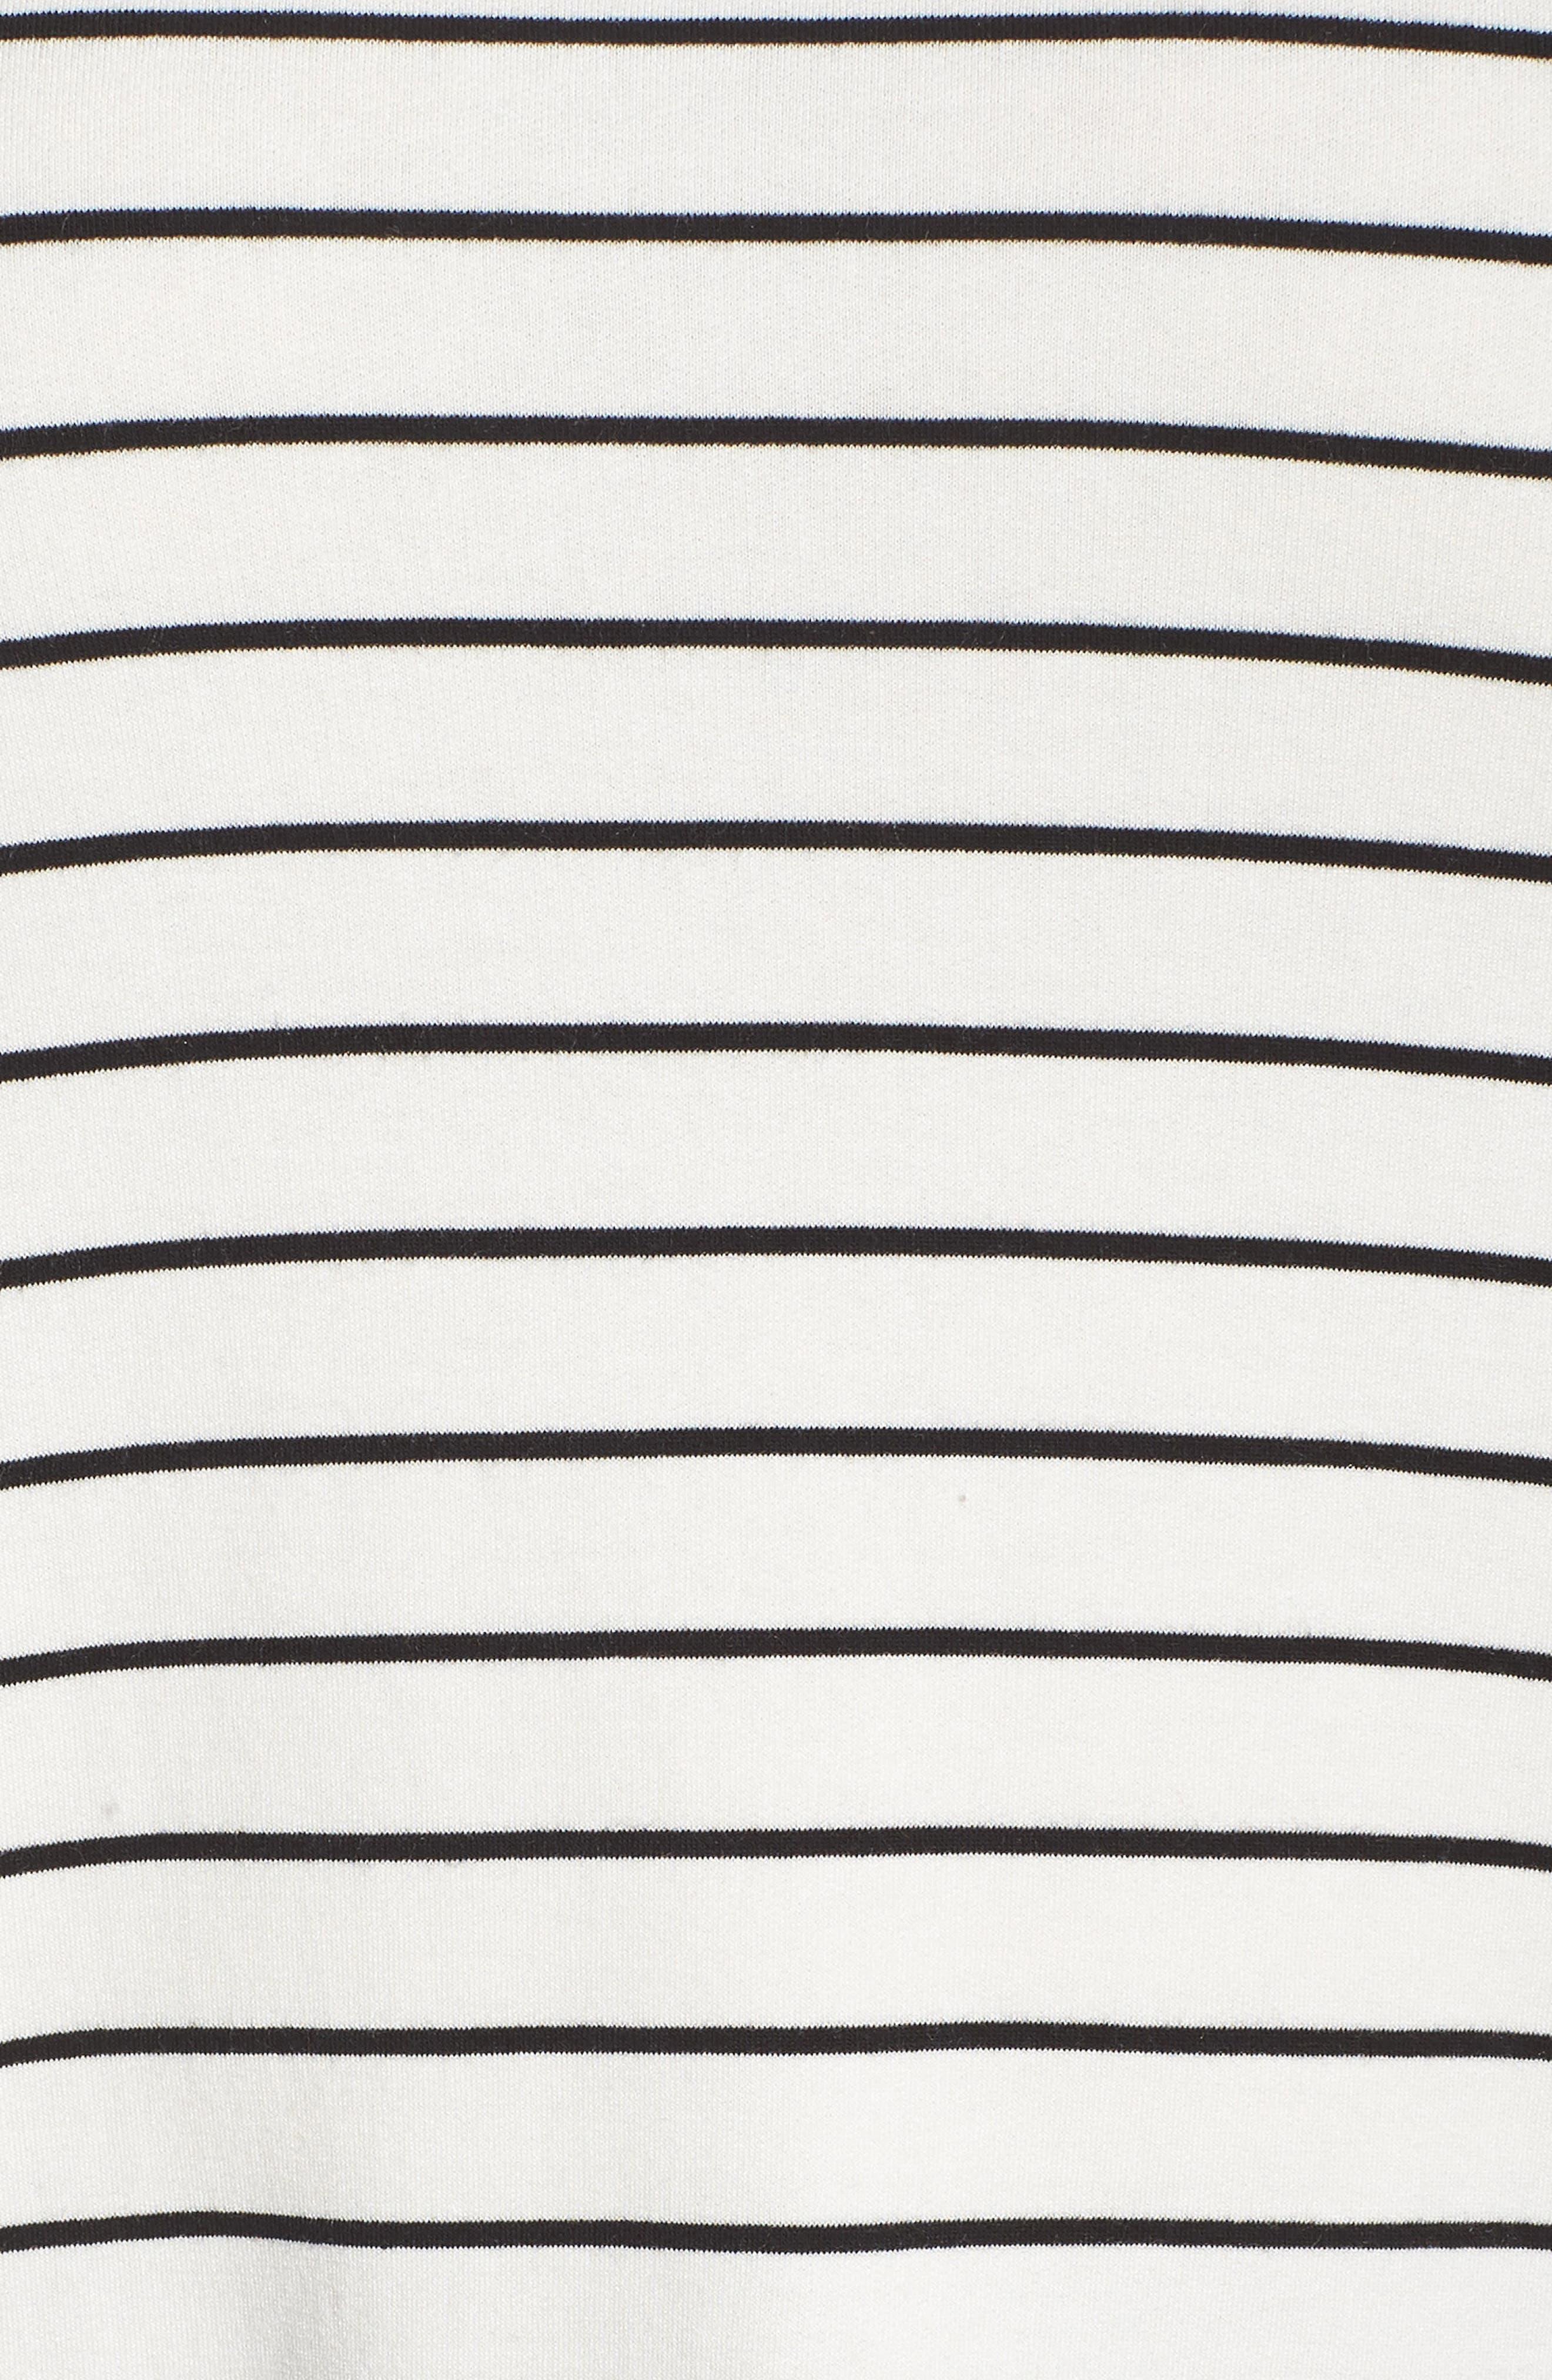 Cowl Neck Tunic Sweatshirt,                             Alternate thumbnail 5, color,                             IVORY- BLACK LUKAH STRIPE